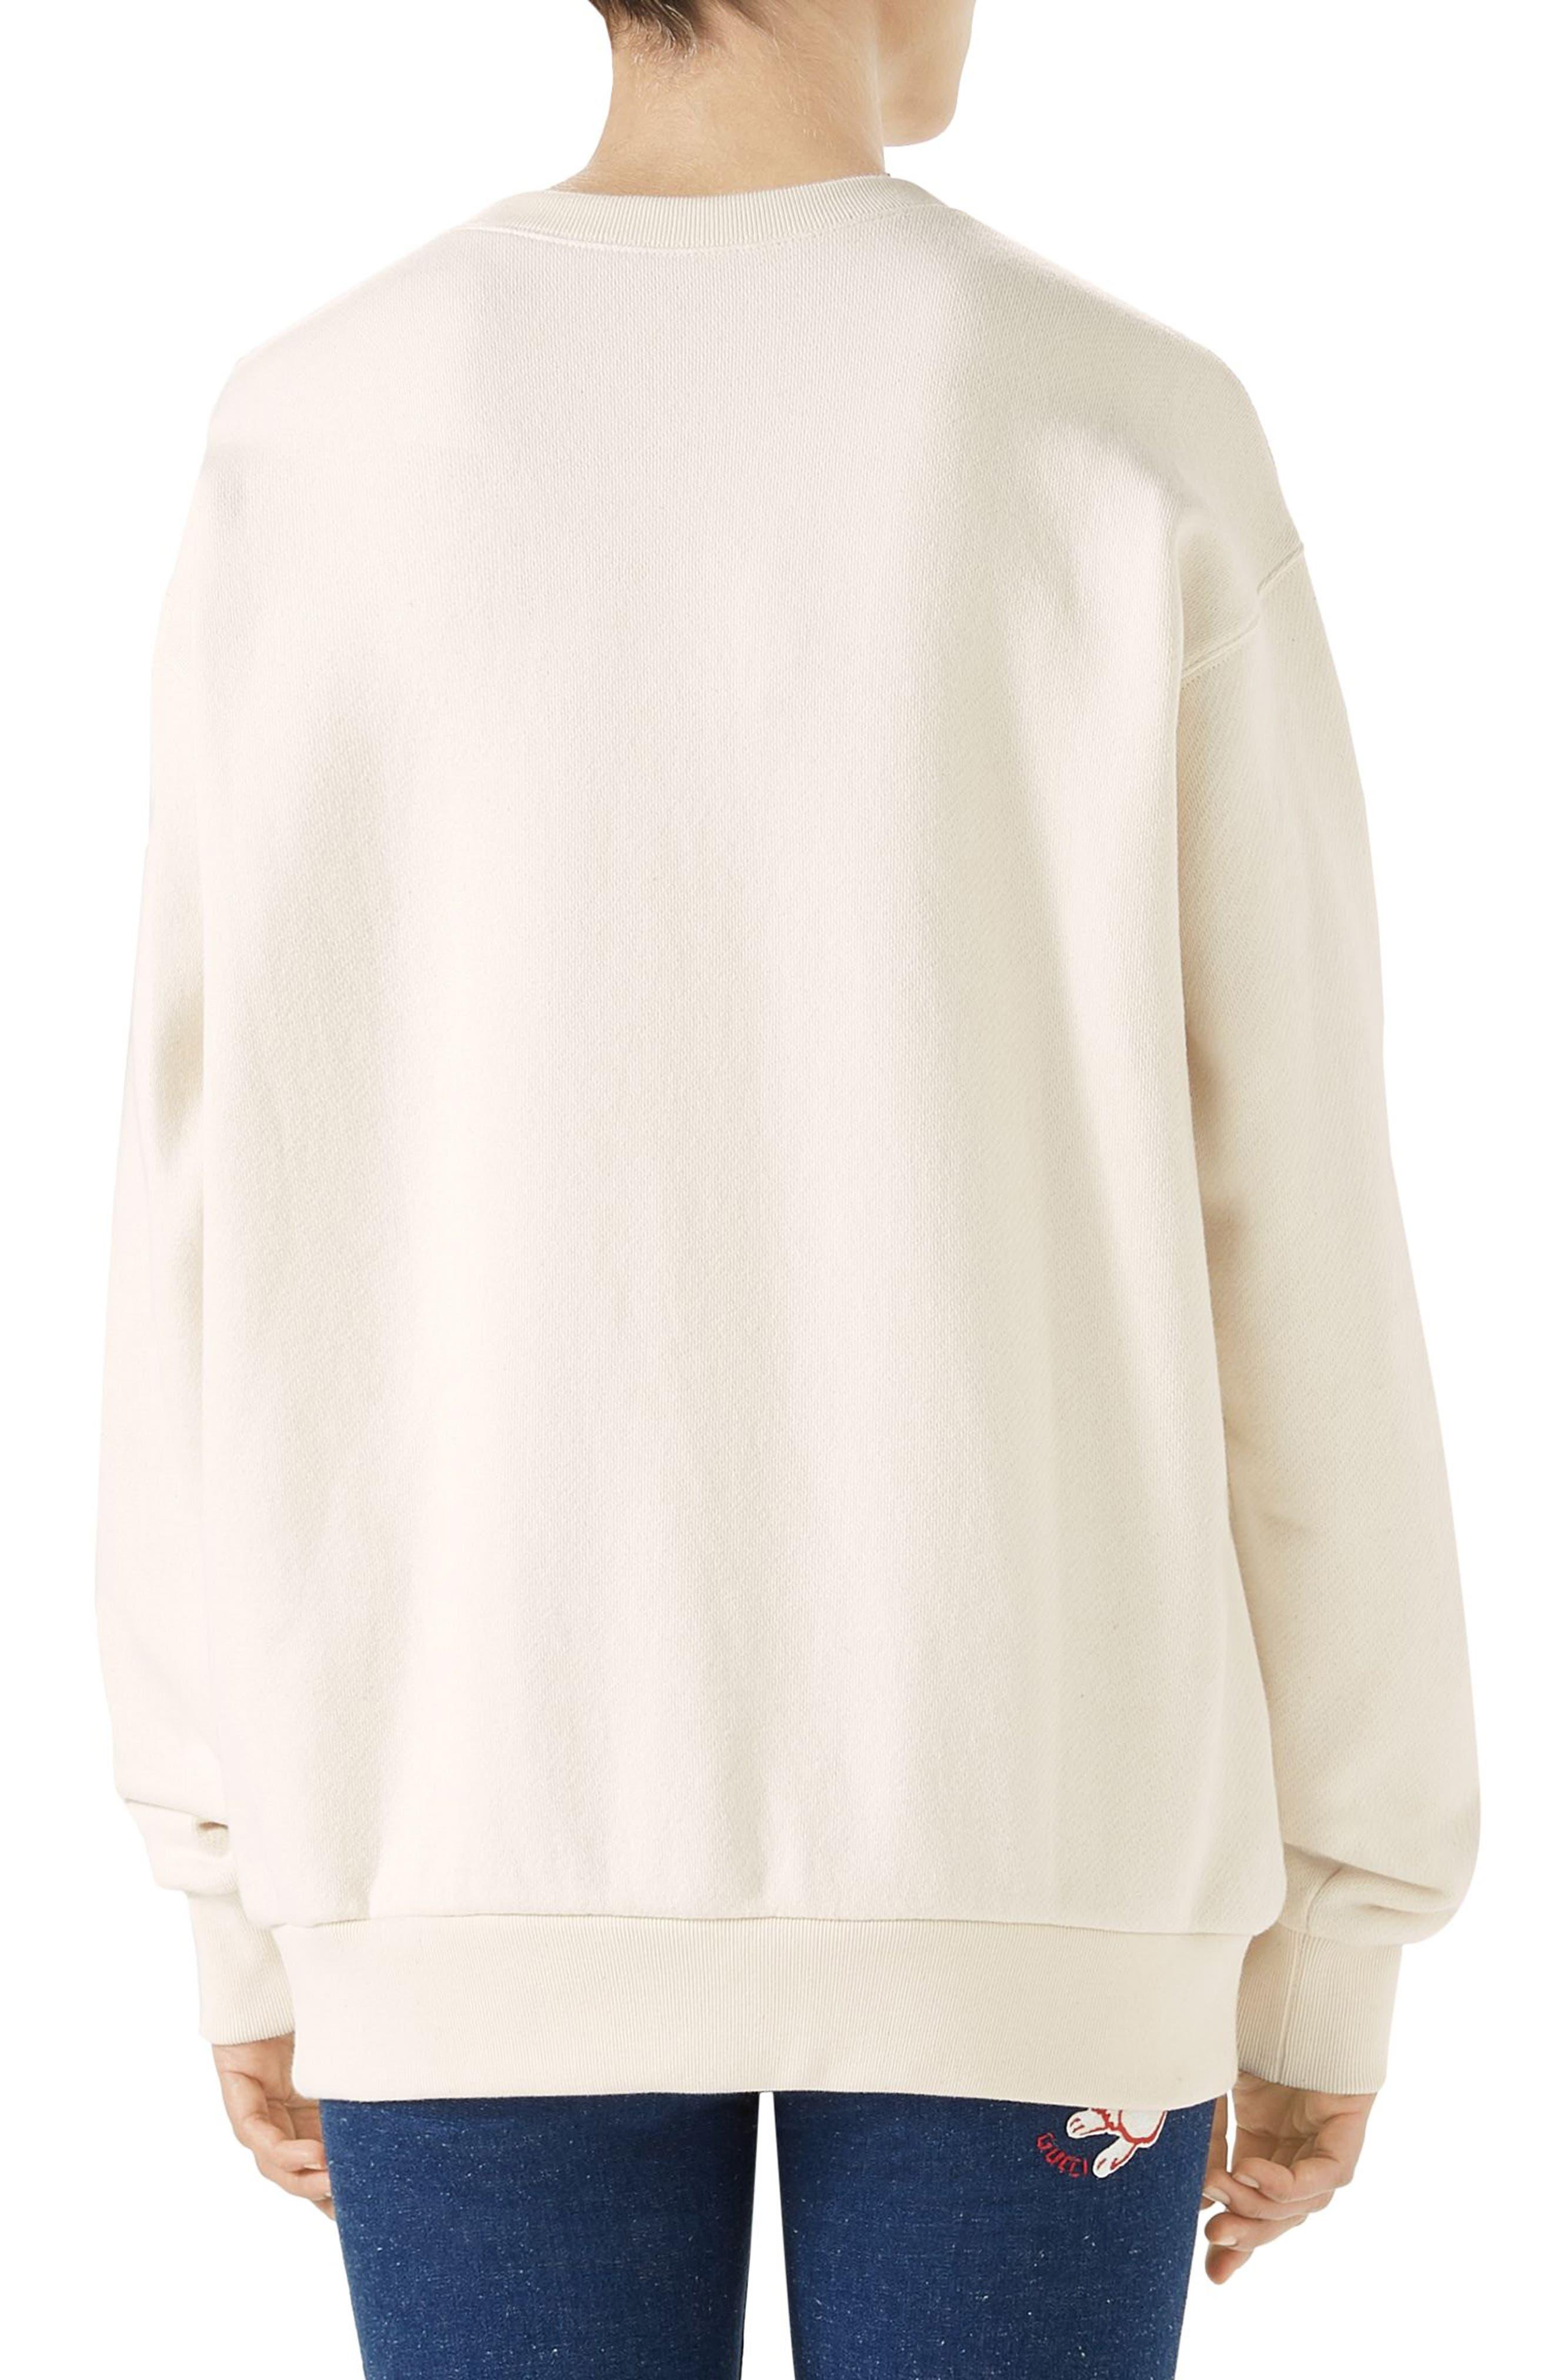 Hypnotism Graphic Sweatshirt,                             Alternate thumbnail 2, color,                             Natural White/ Multicolor